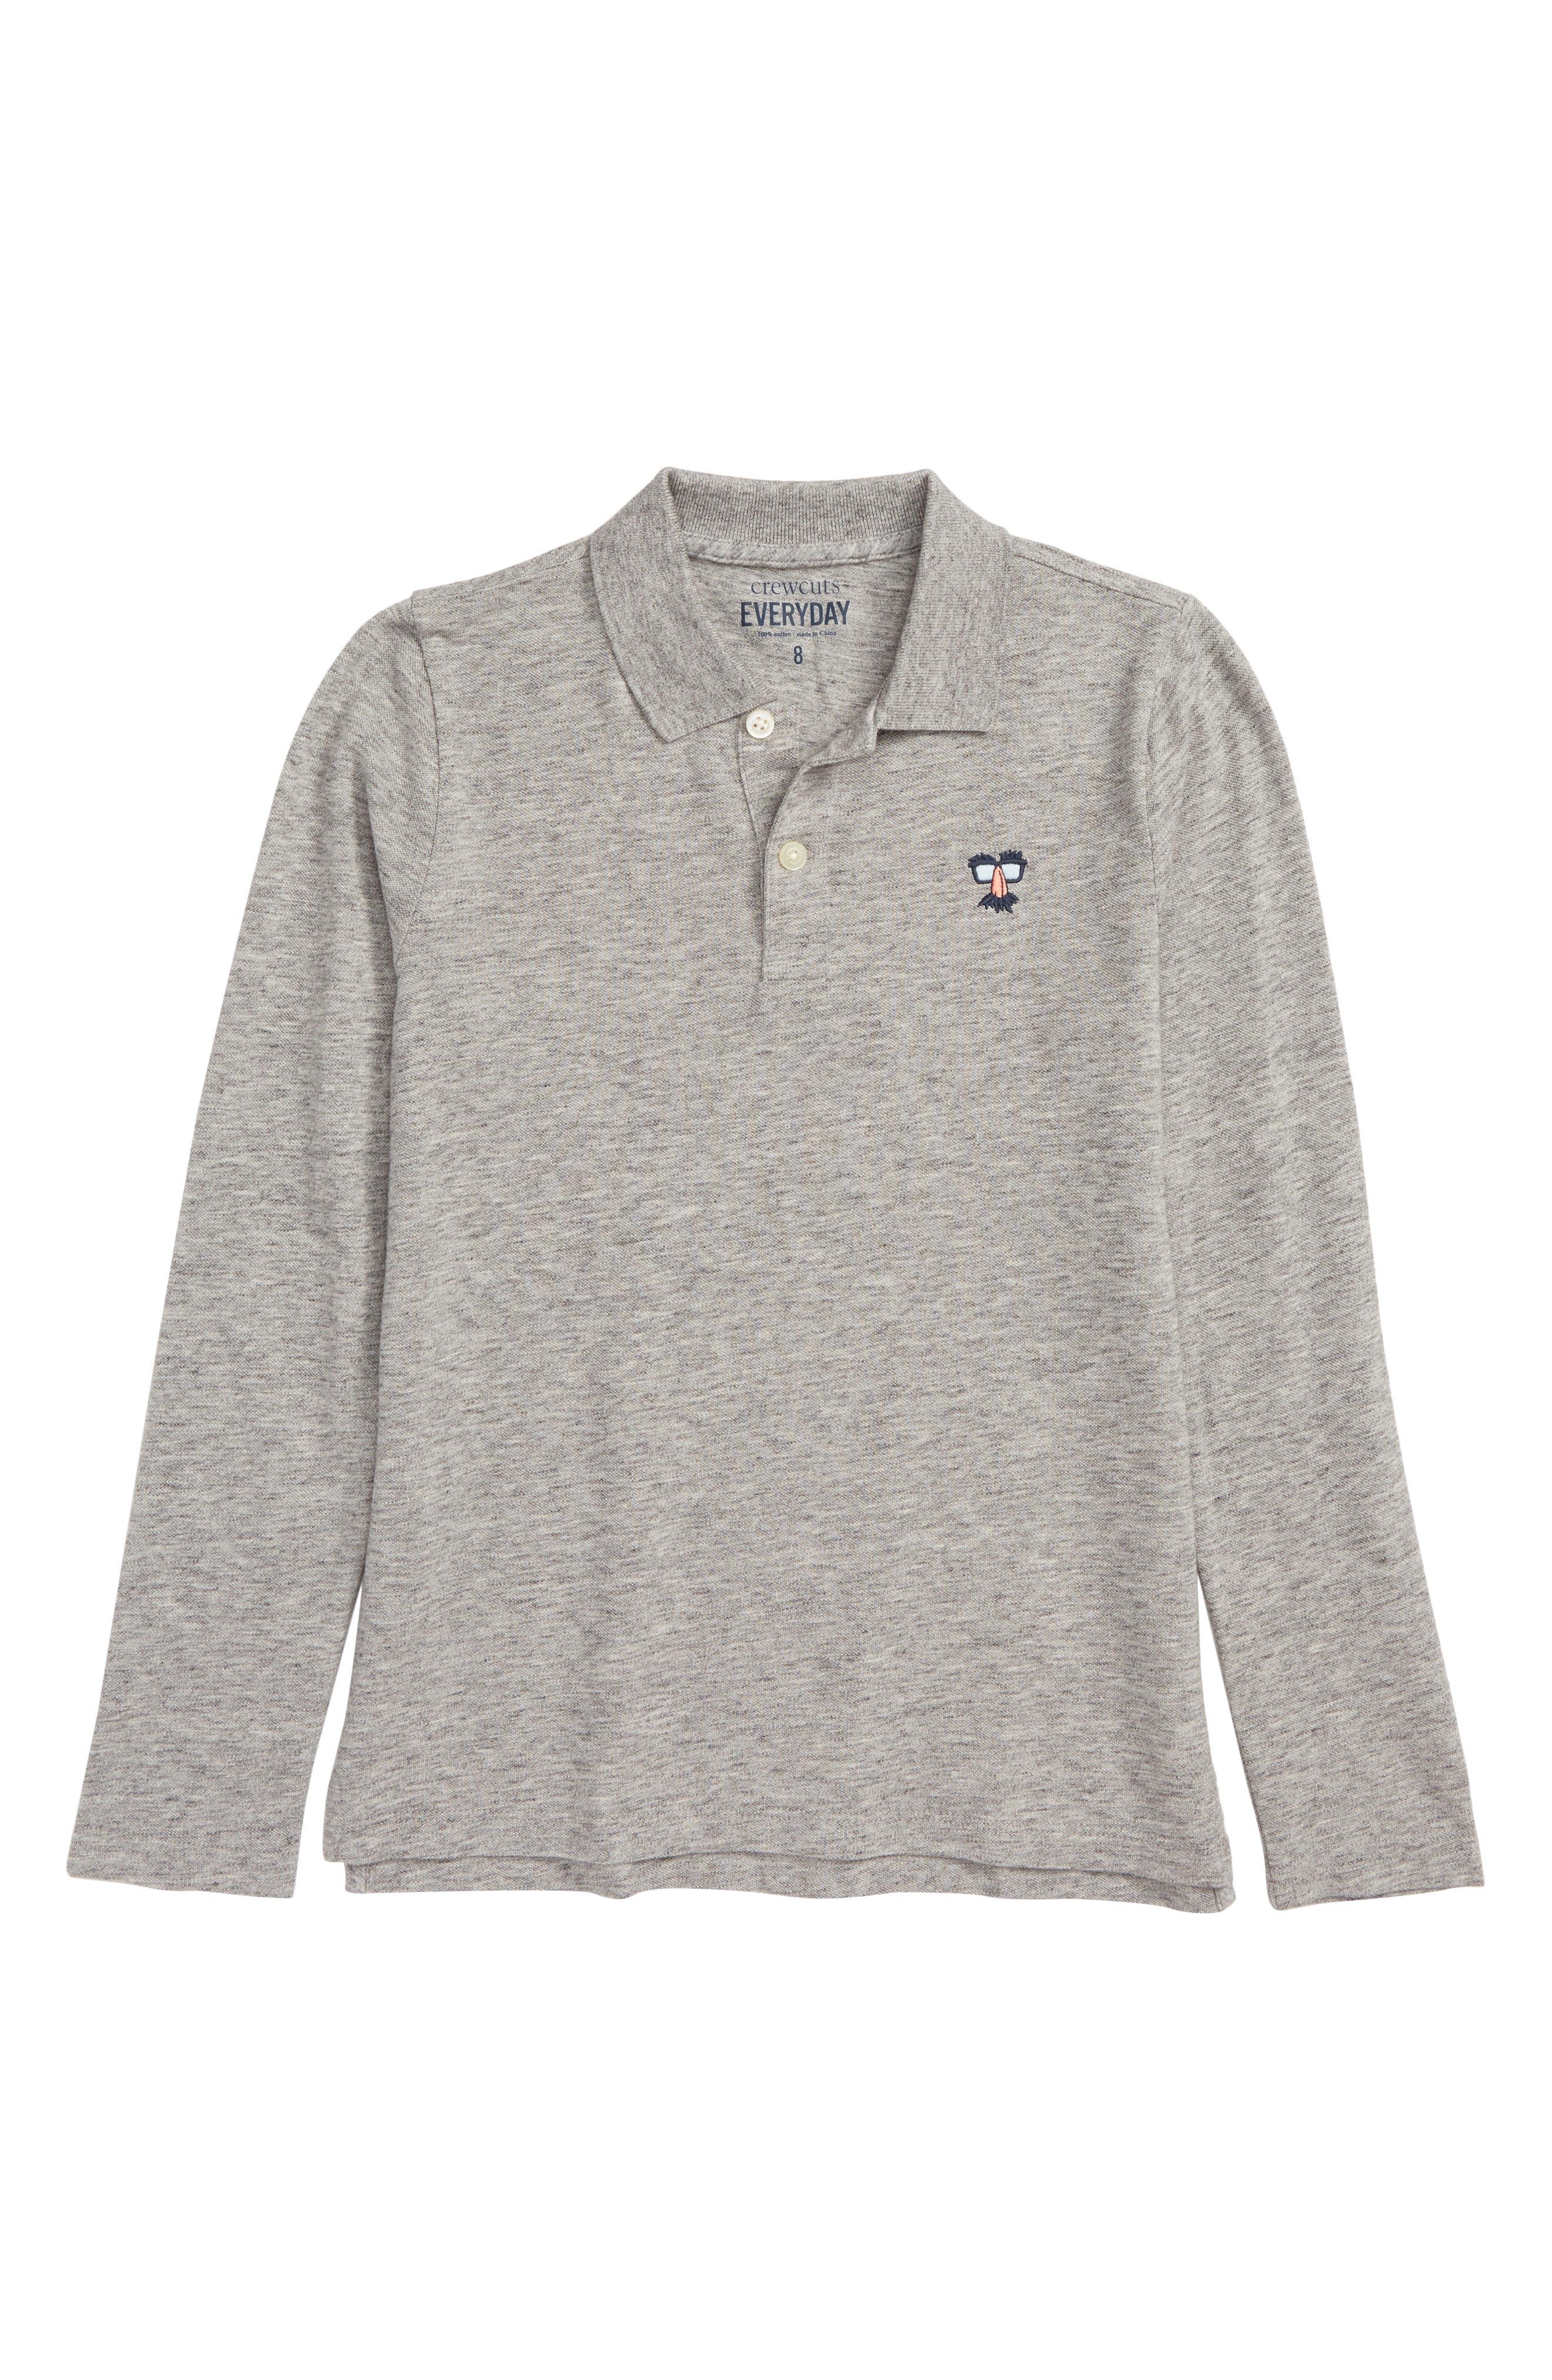 Critter Long Sleeve Polo,                         Main,                         color, 020